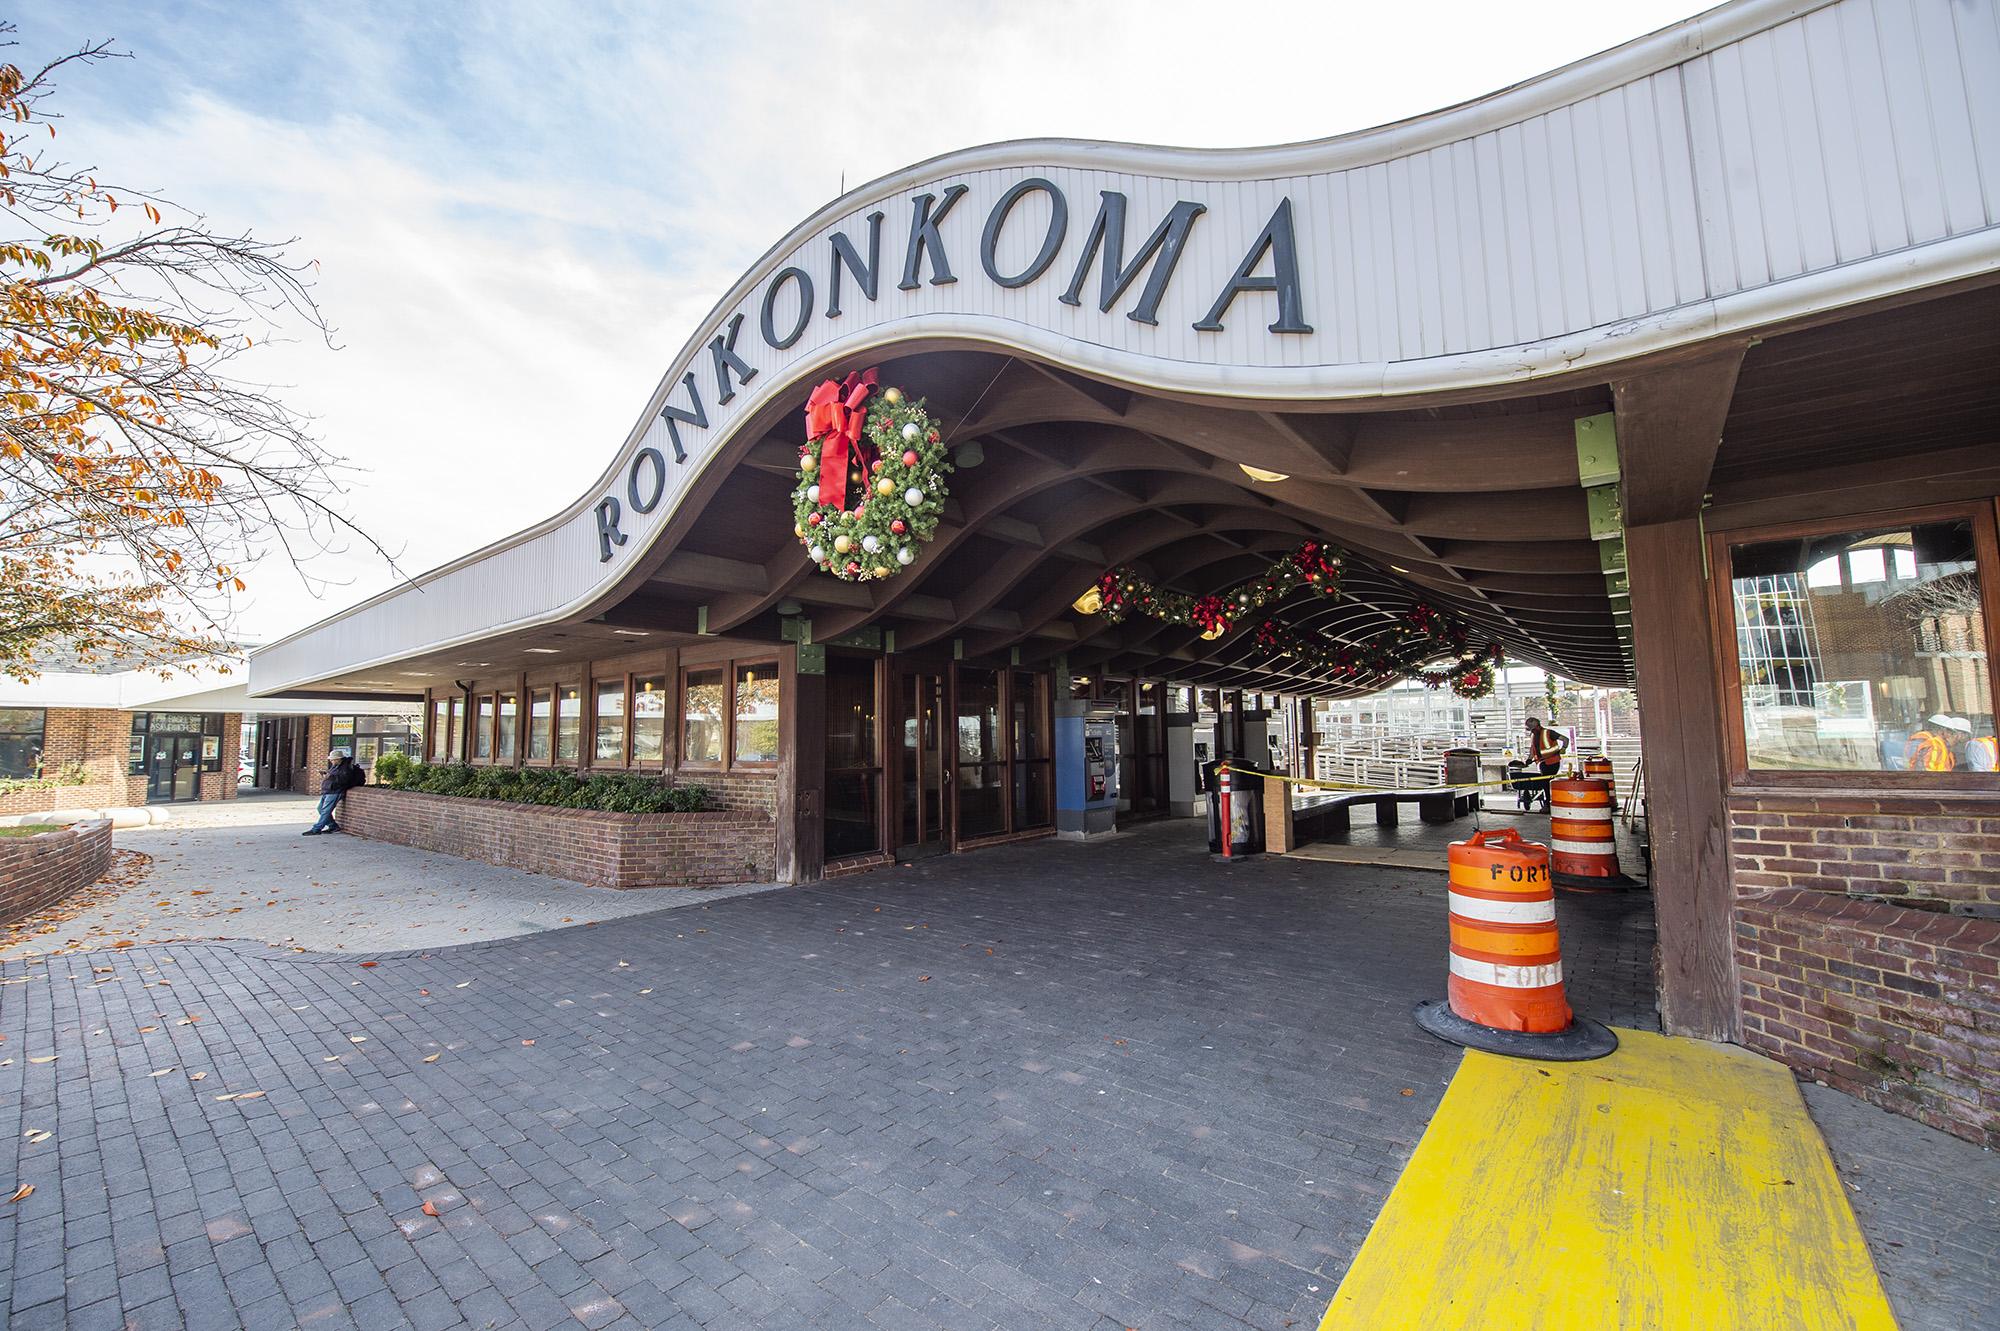 Ronkonkoma Station 11-08-18